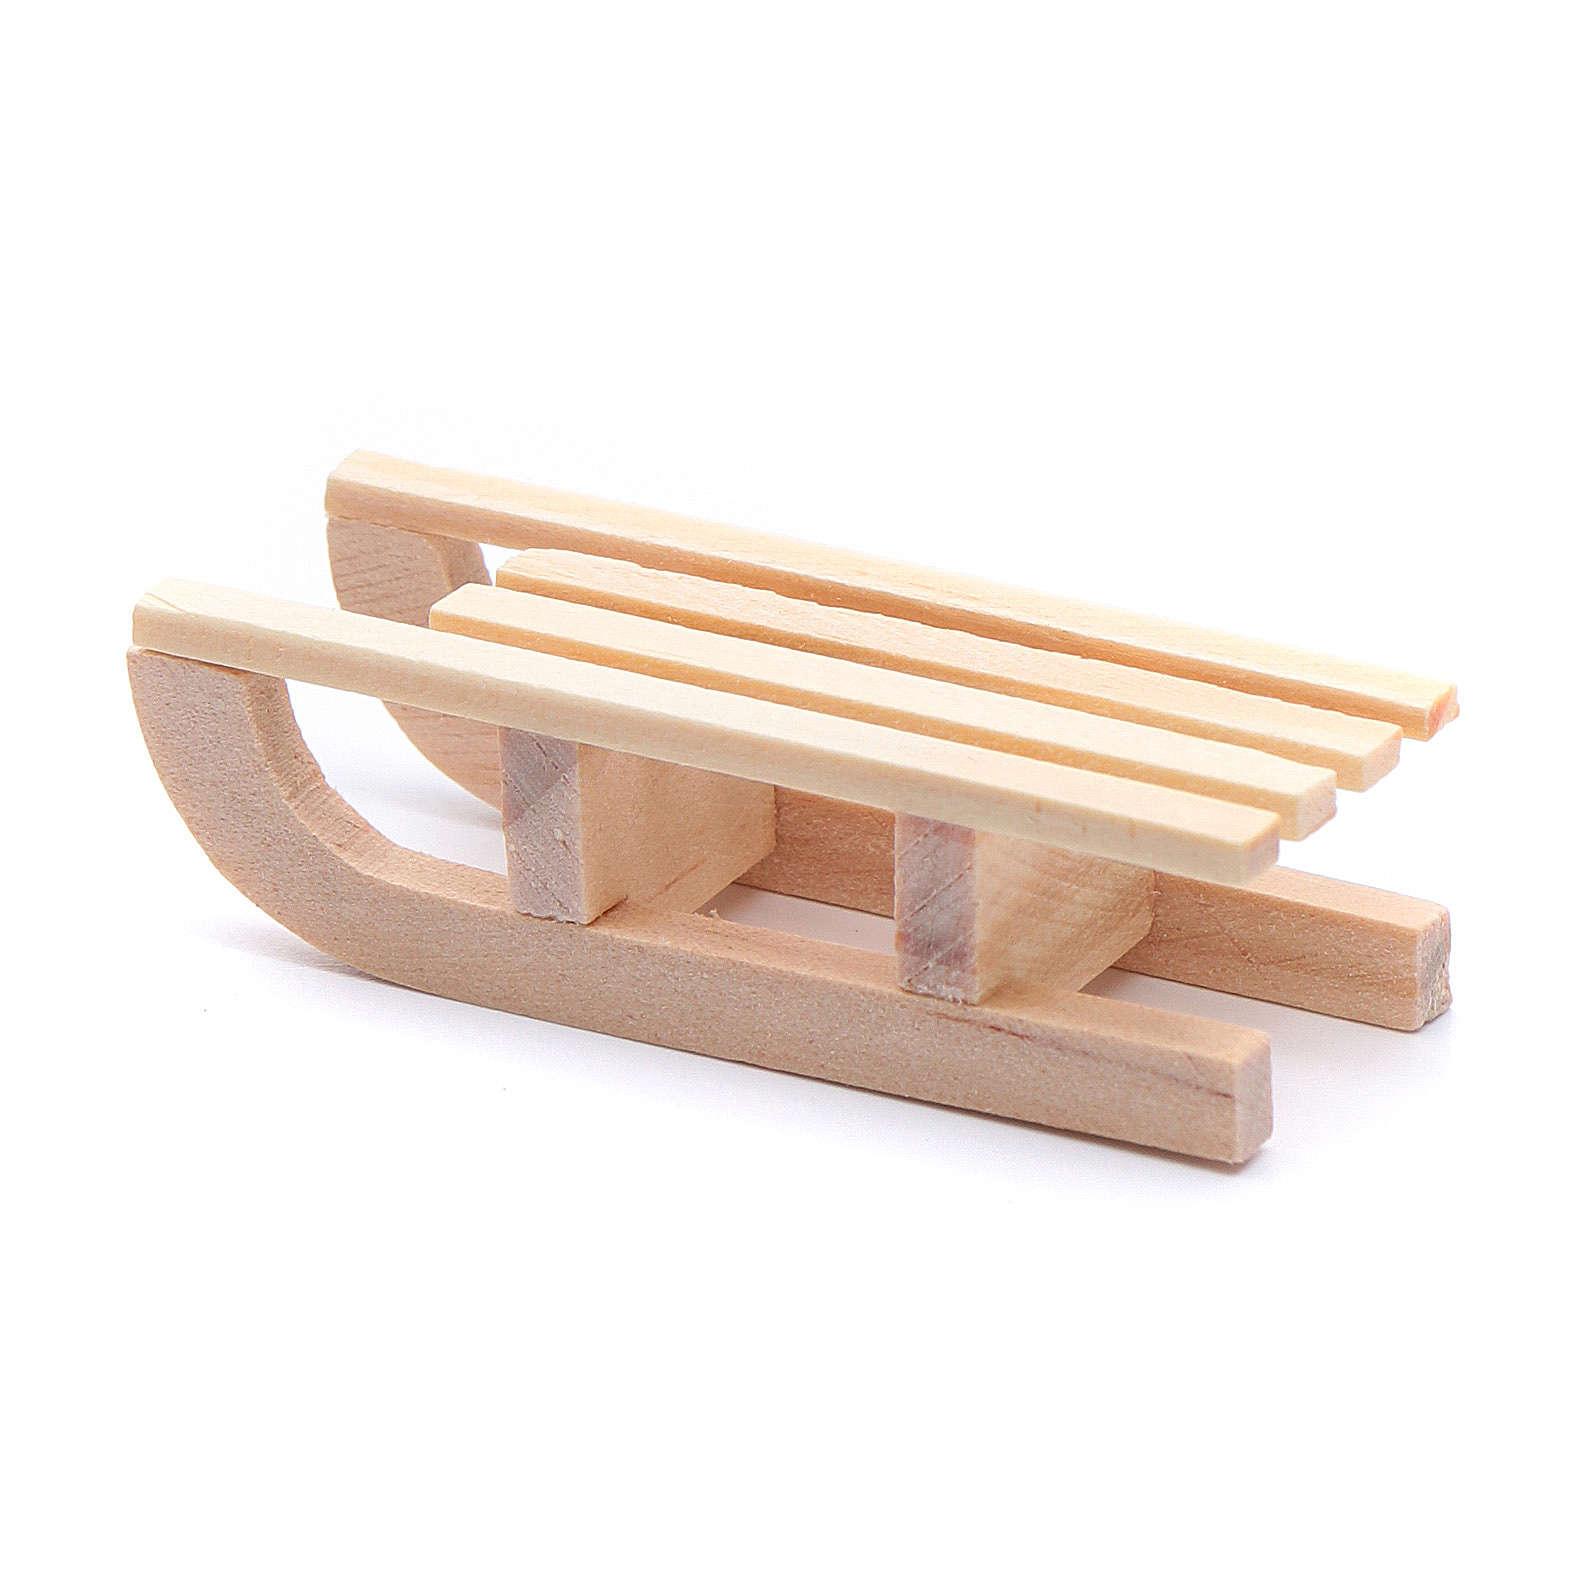 Trineo madera 1,5x5x2 cm para belén 4